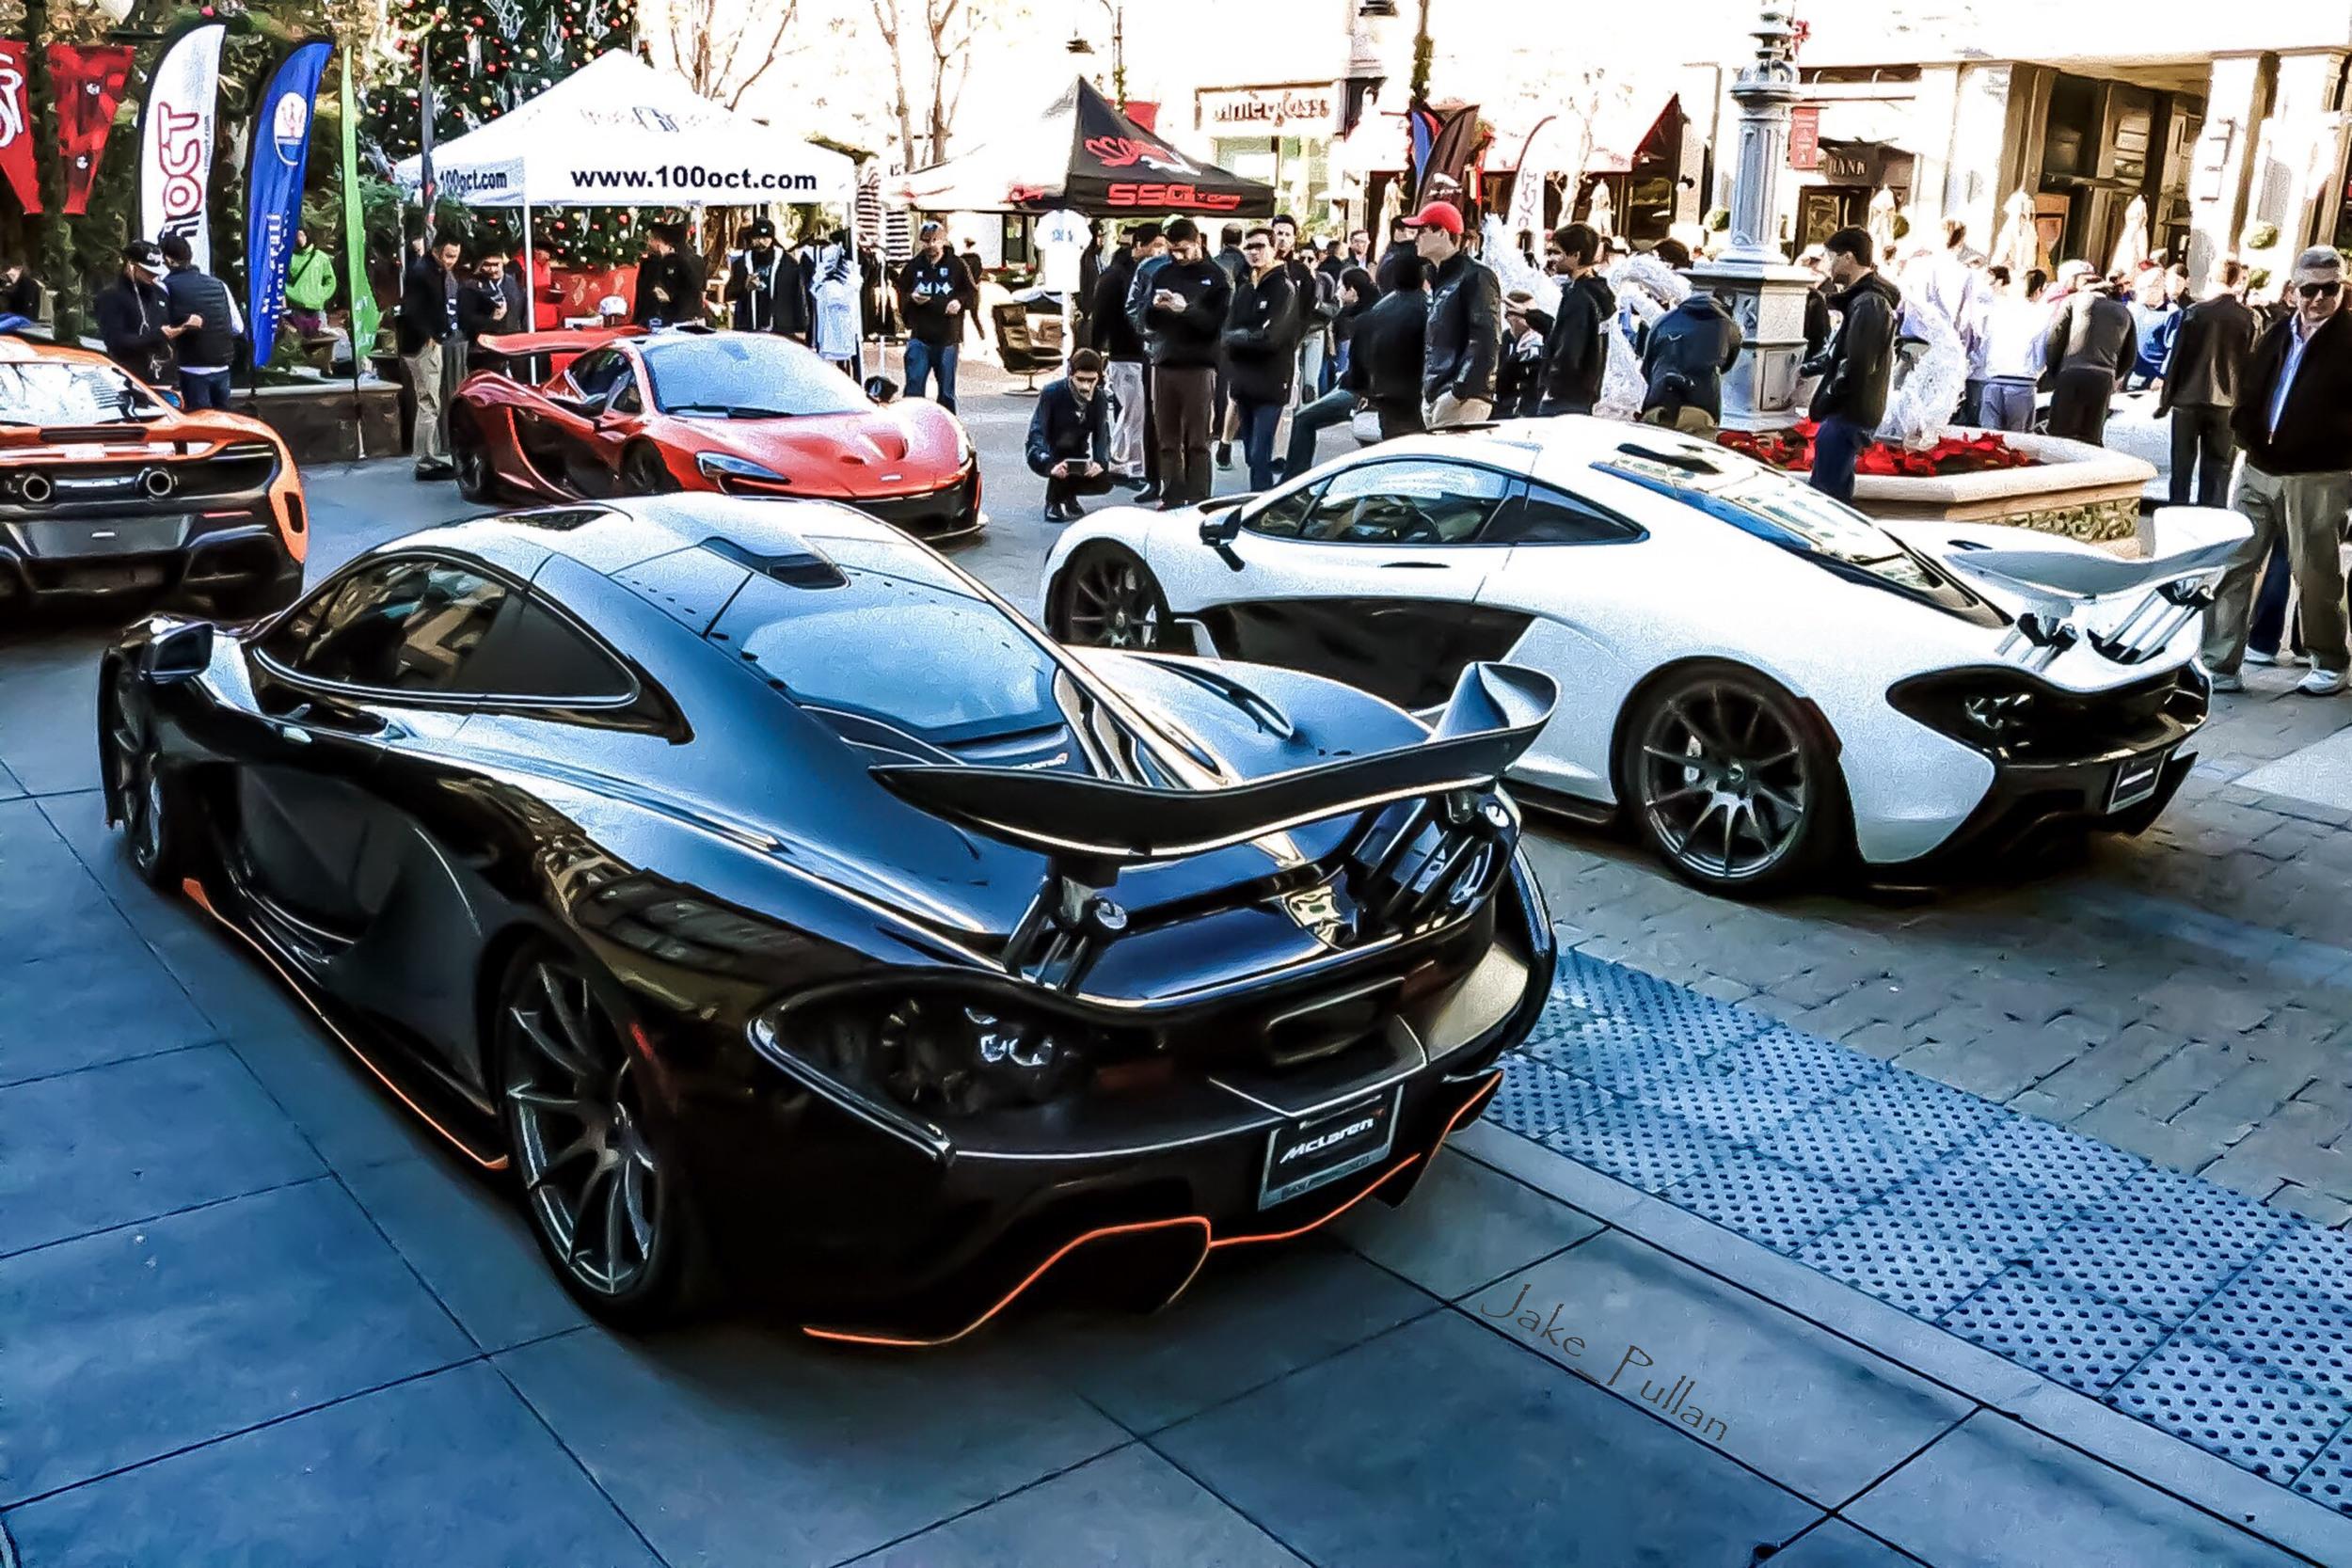 Credits: Jake Pullan - Three McLaren P1s and a McLaren 675LT